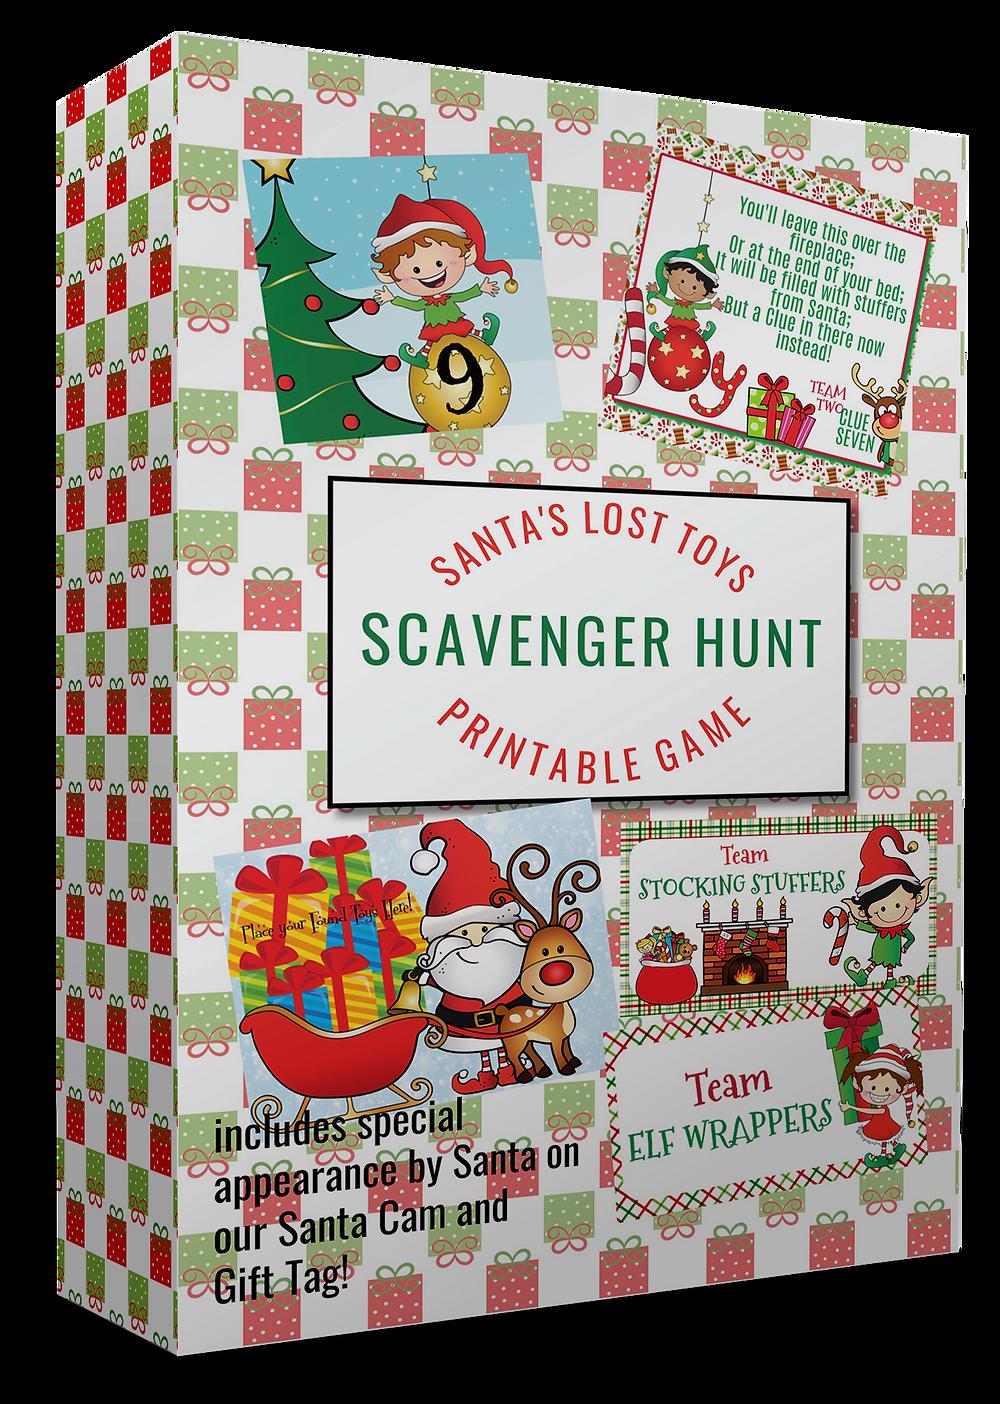 Christmas Scavenger Hunt / Santa Claus Games / Santa Games / Holiday Games / Holiday Activities / Christmas Games / Christmas Activities for kids / Present Scavenger Hunt / Birthday Scavenger Hunt